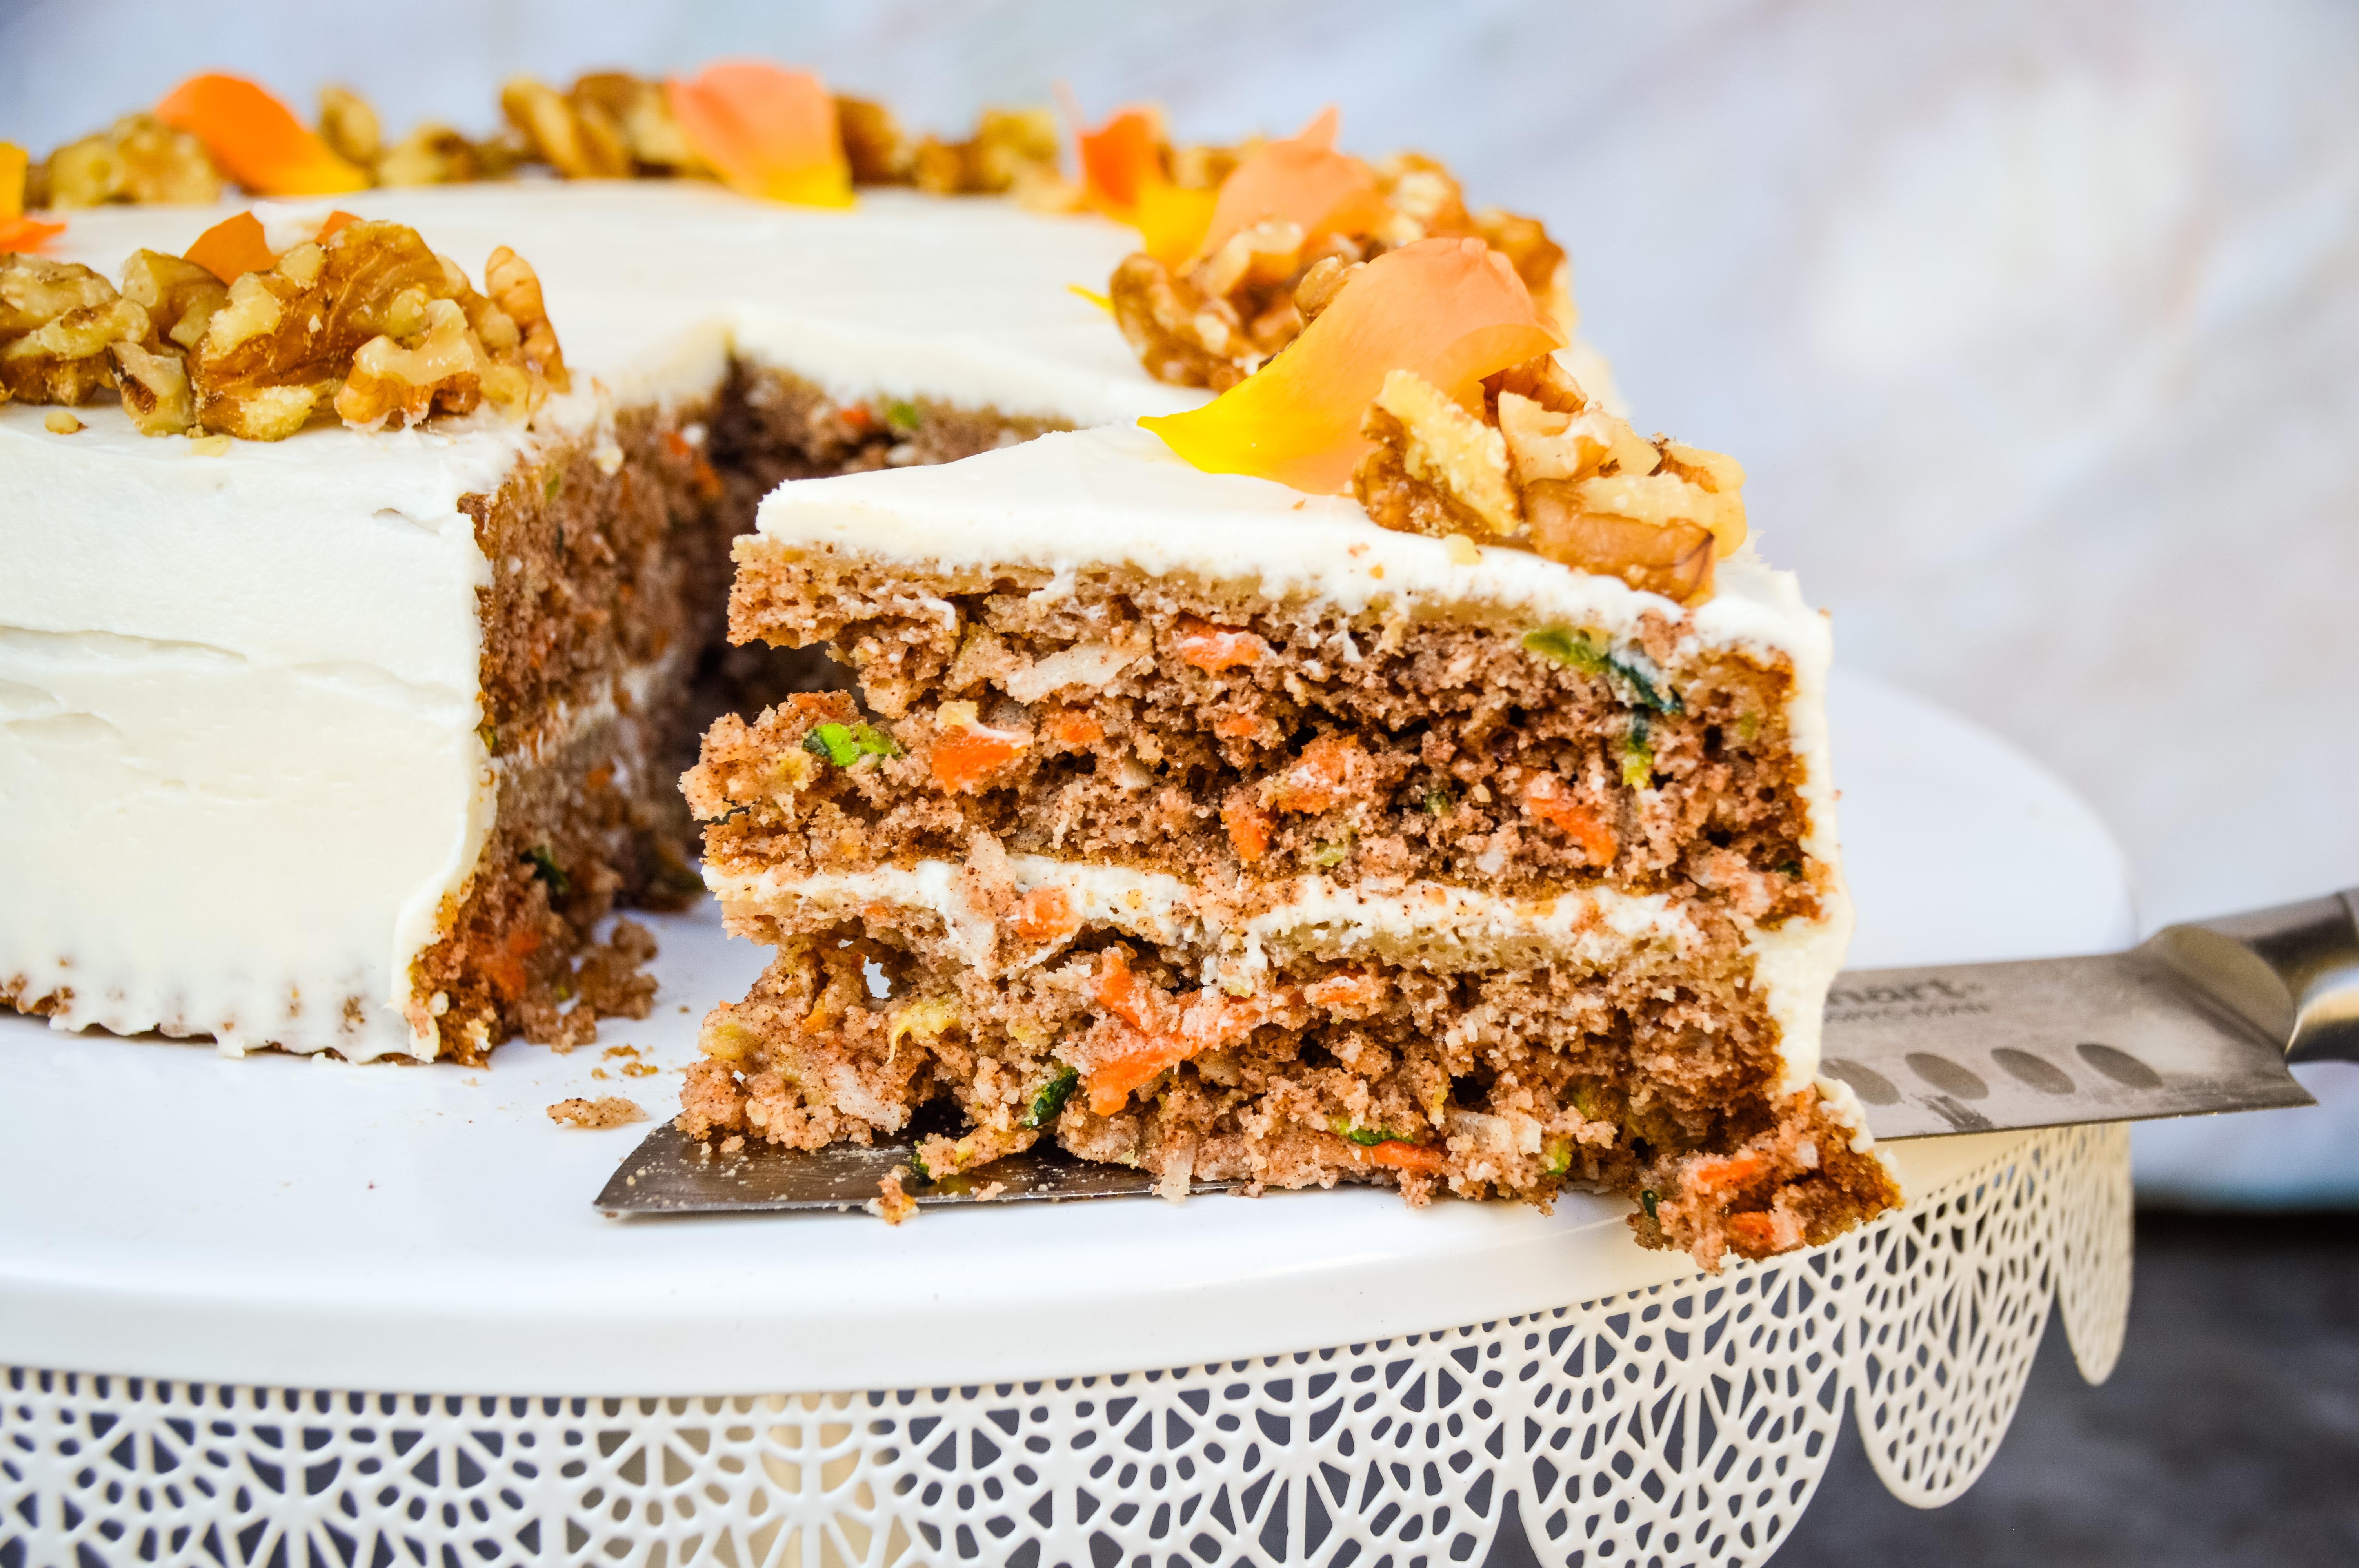 This Healthy Carrot & Zucchini Cake Recipe